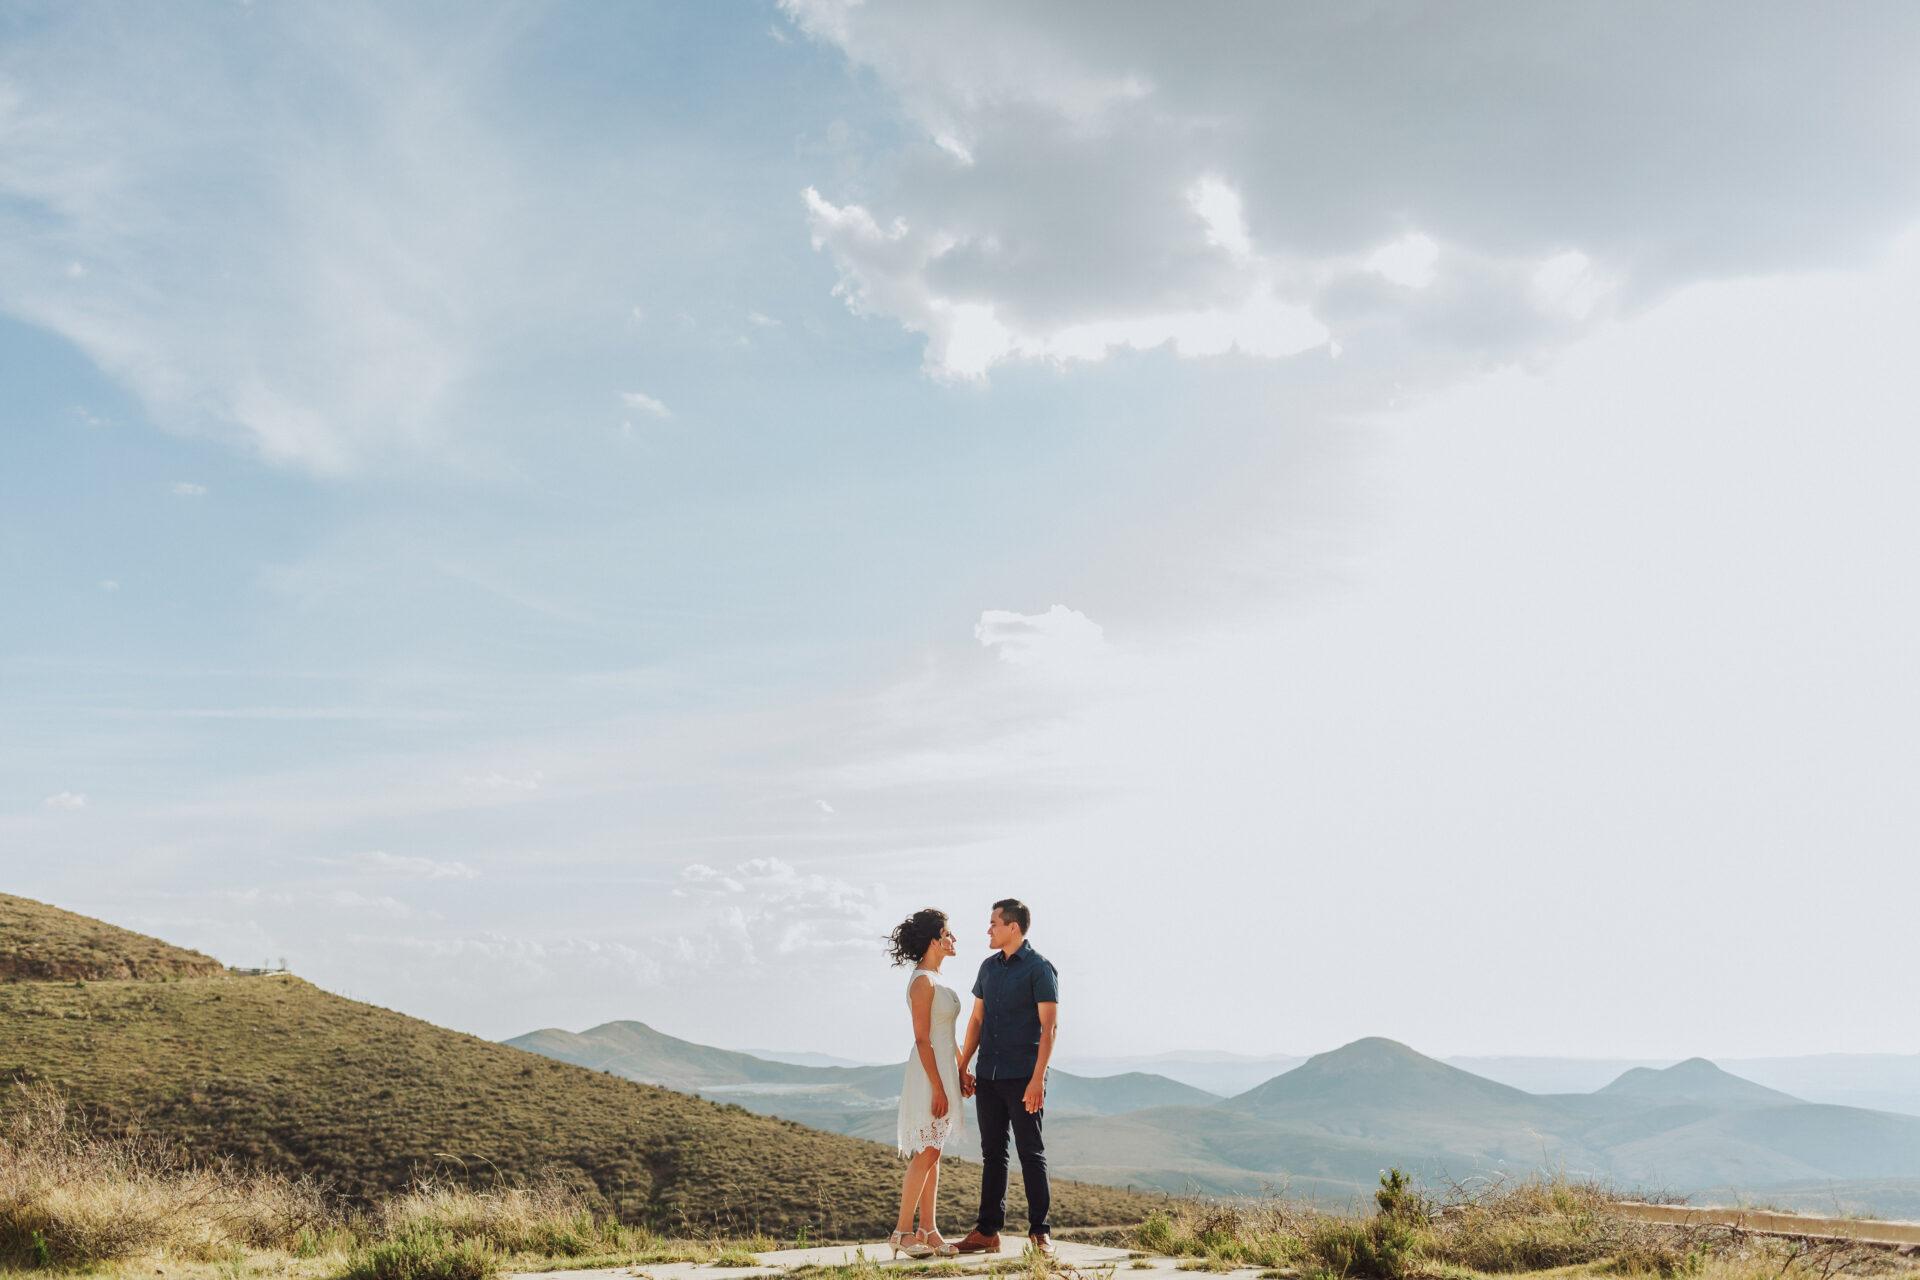 javier_noriega_fotografo_save_the_date_zacatecas_wedding_photographer5